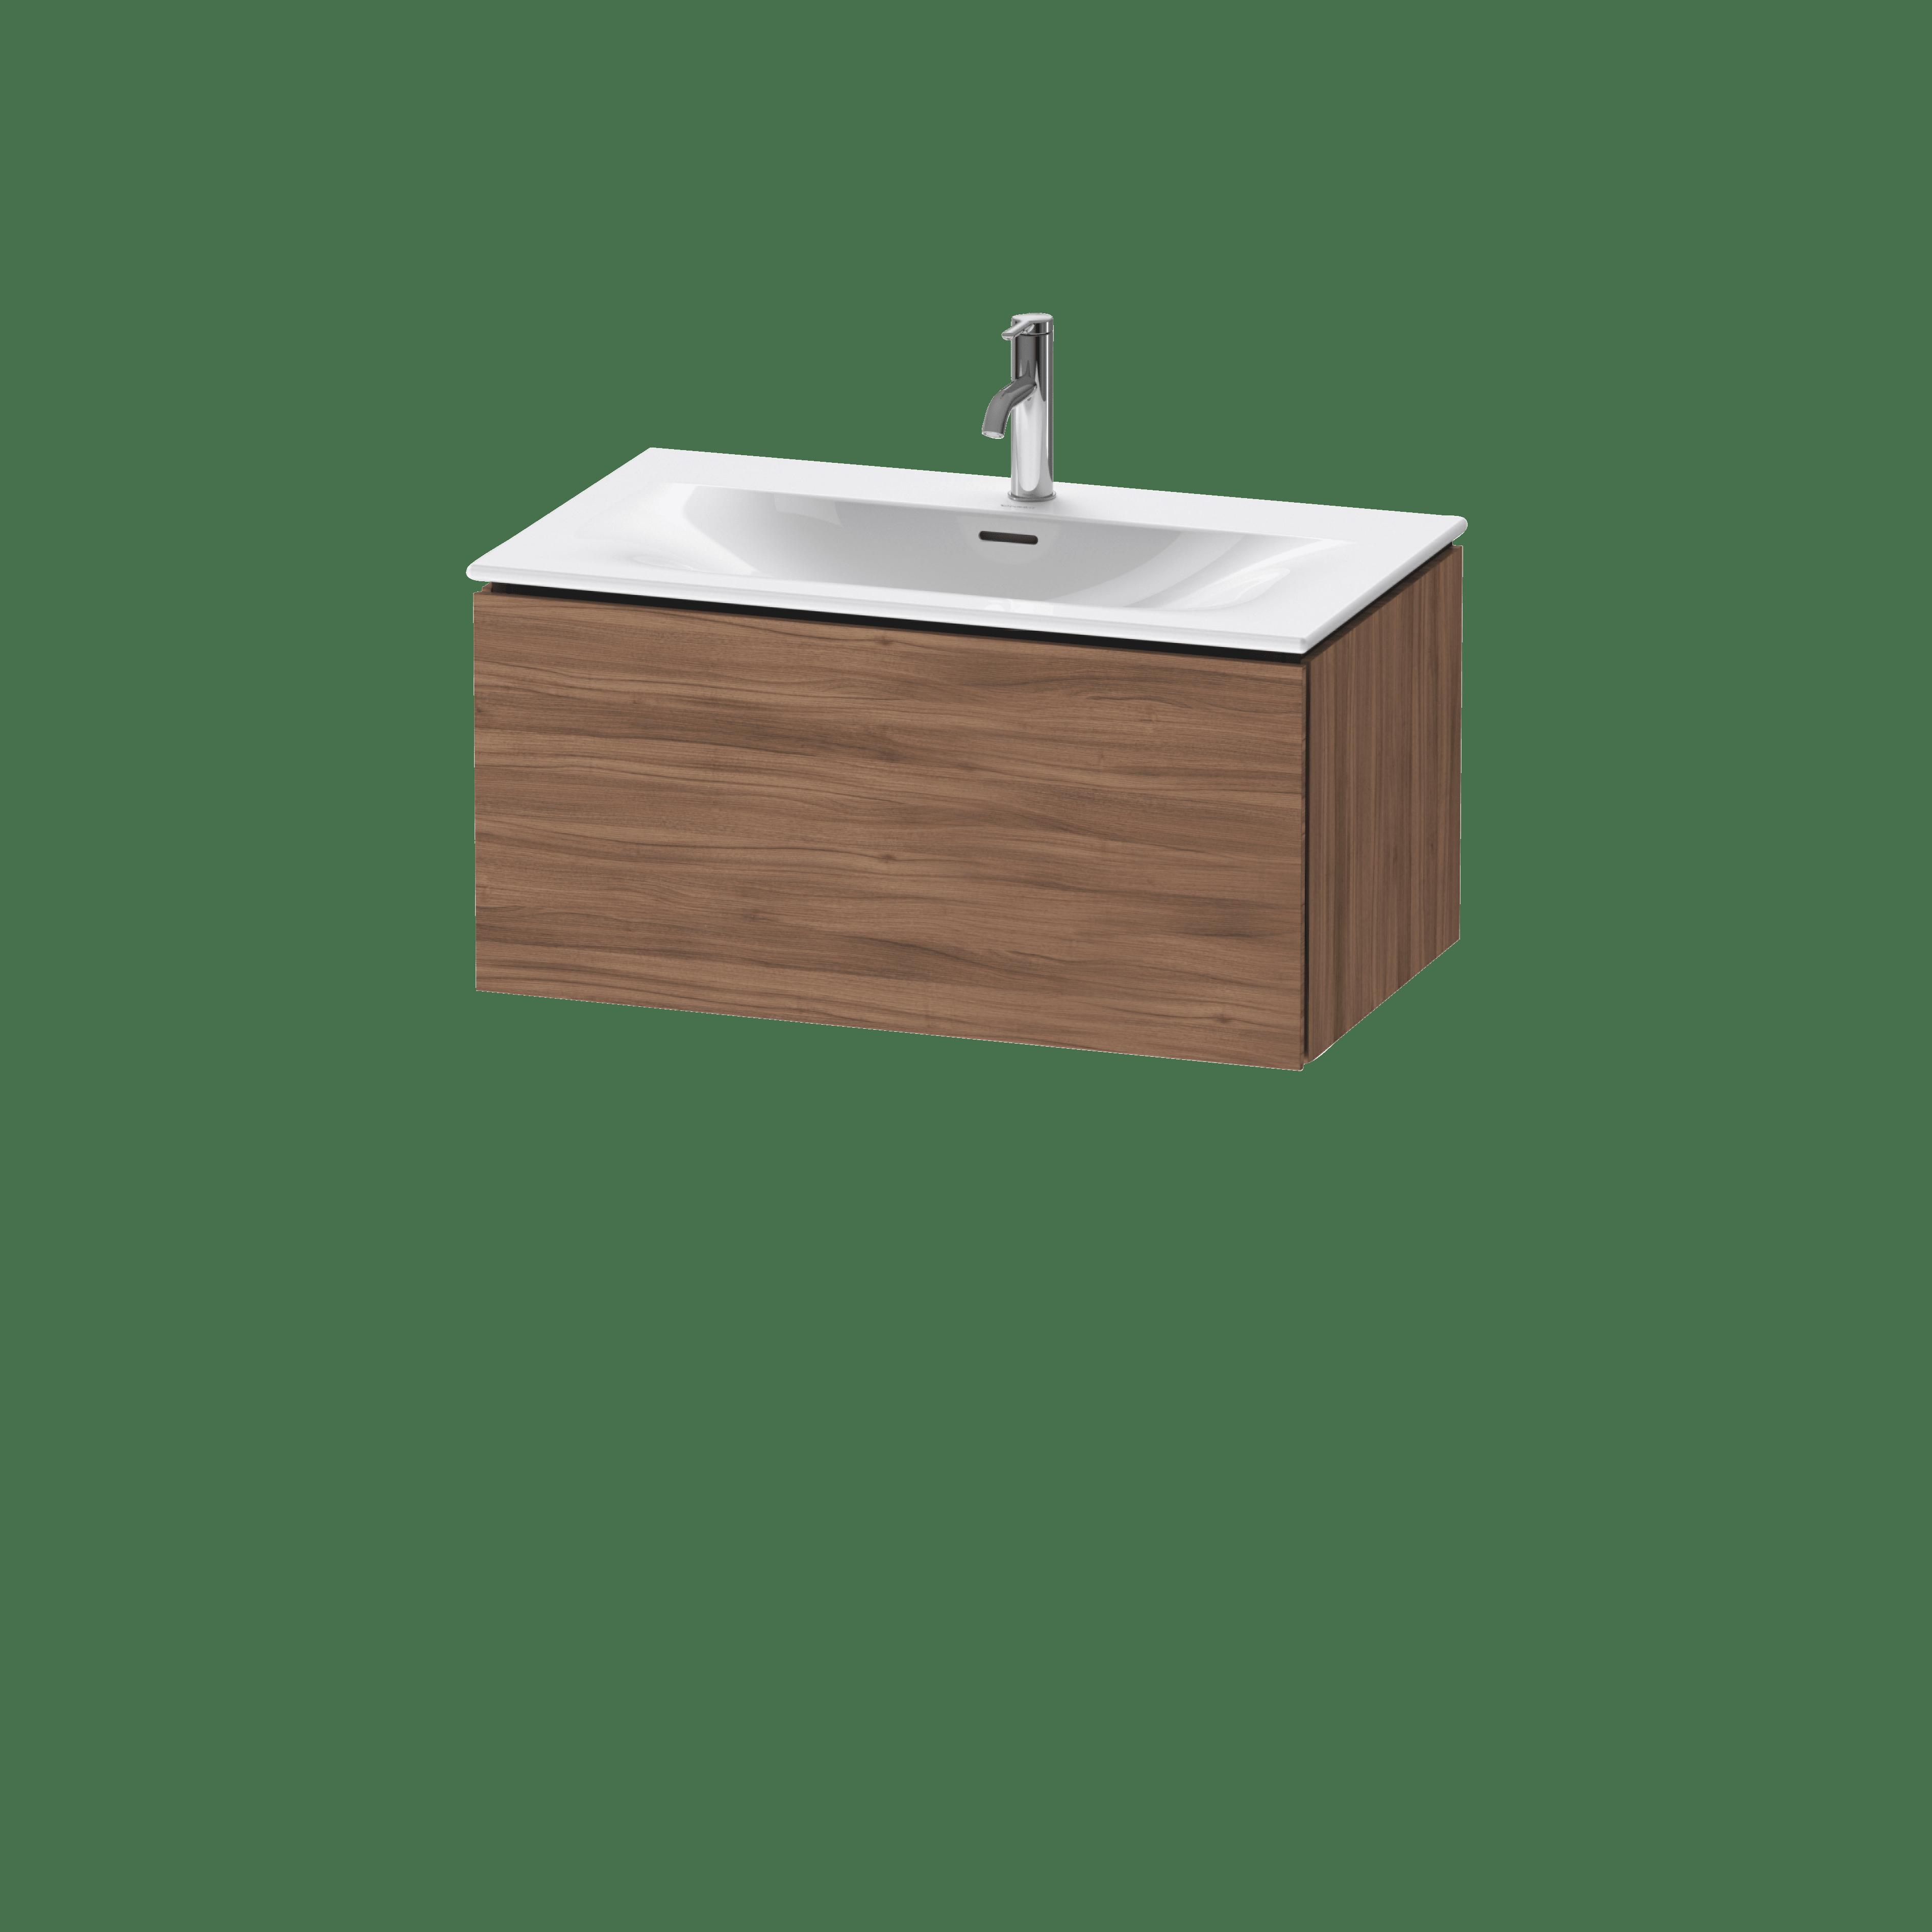 Duravit Lc6137 L Cube 32 1 4 Wall Mount Vanity Qualitybath Com